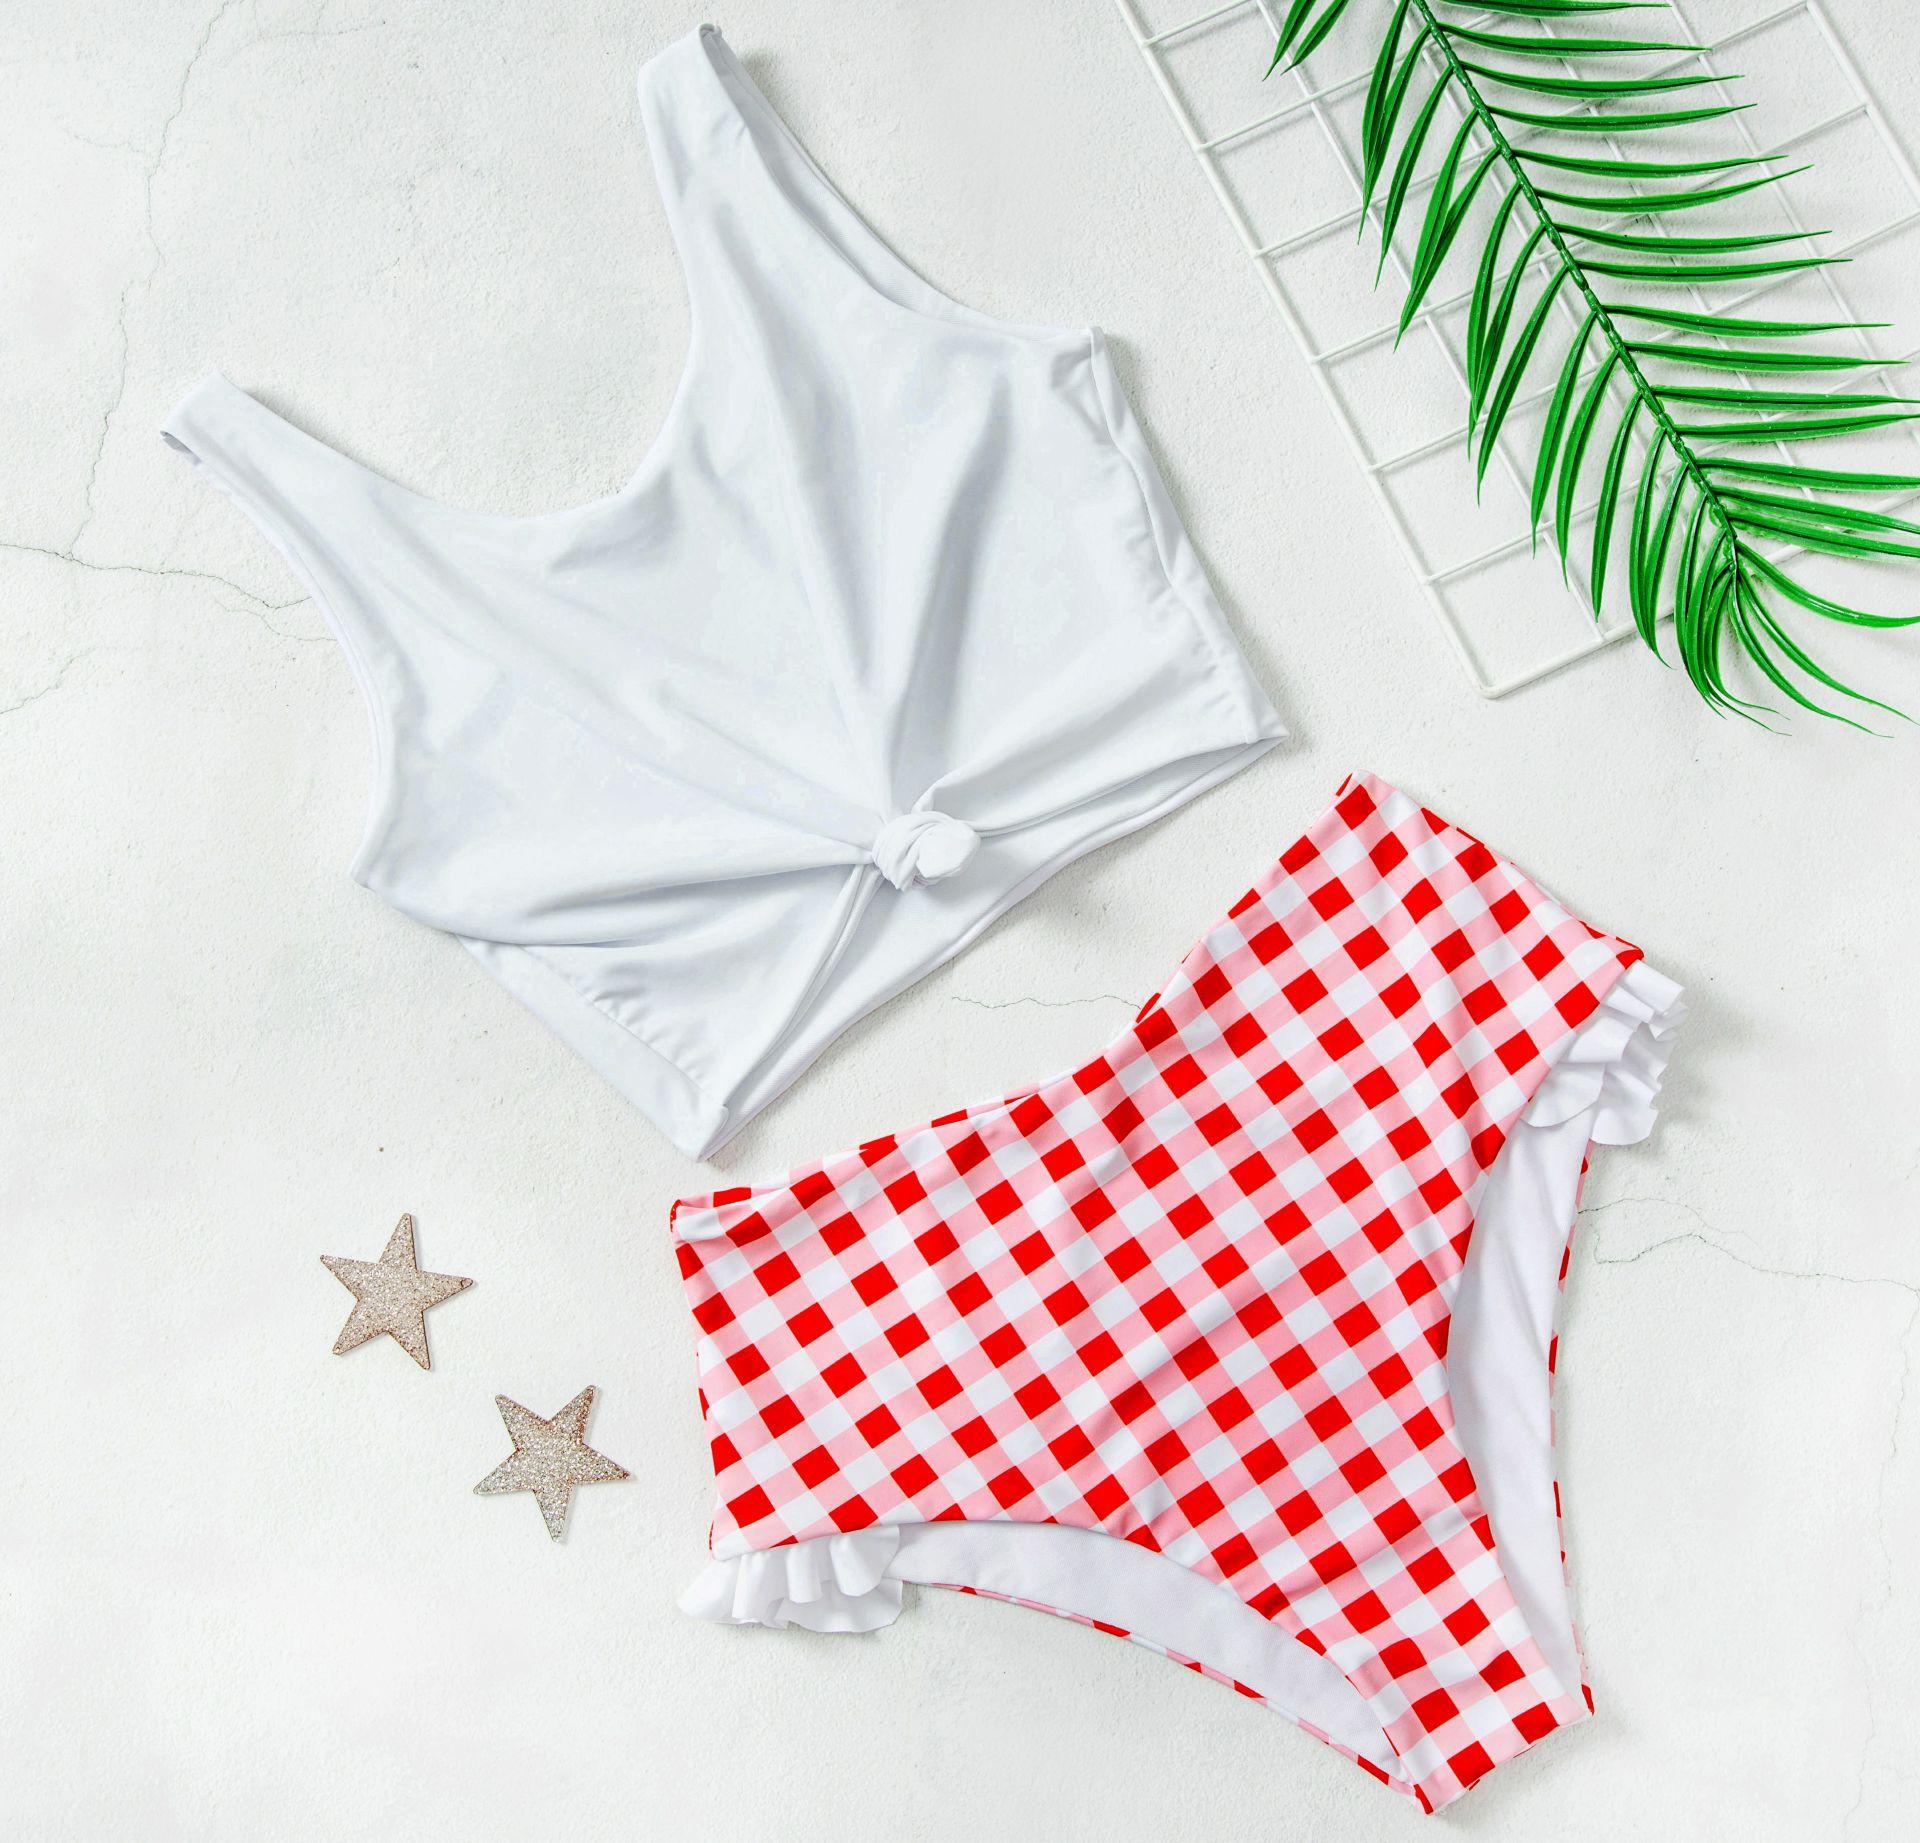 New Sexy High Waist Bikini Push Up Swimwear 2020 Female Ruffle Gingham Swimsuit Women Two-pieces High Cut Bathing Suit Swim Wear